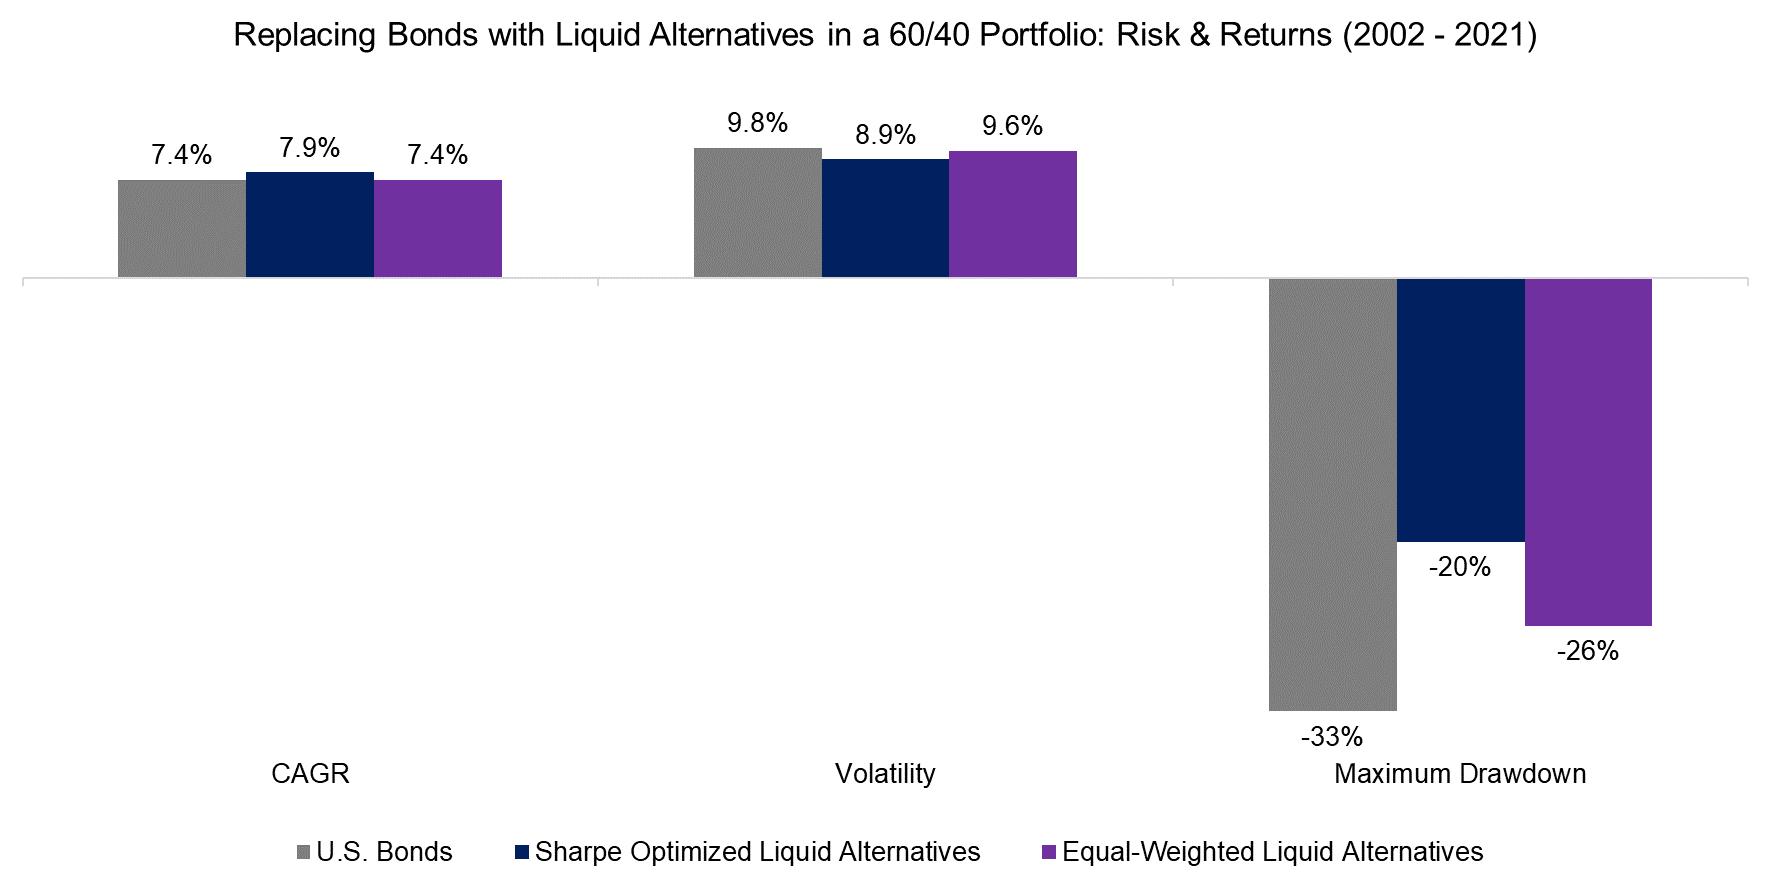 Replacing Bonds with Liquid Alternatives in a 6040 Portfolio Risk & Returns (2002 - 2021)